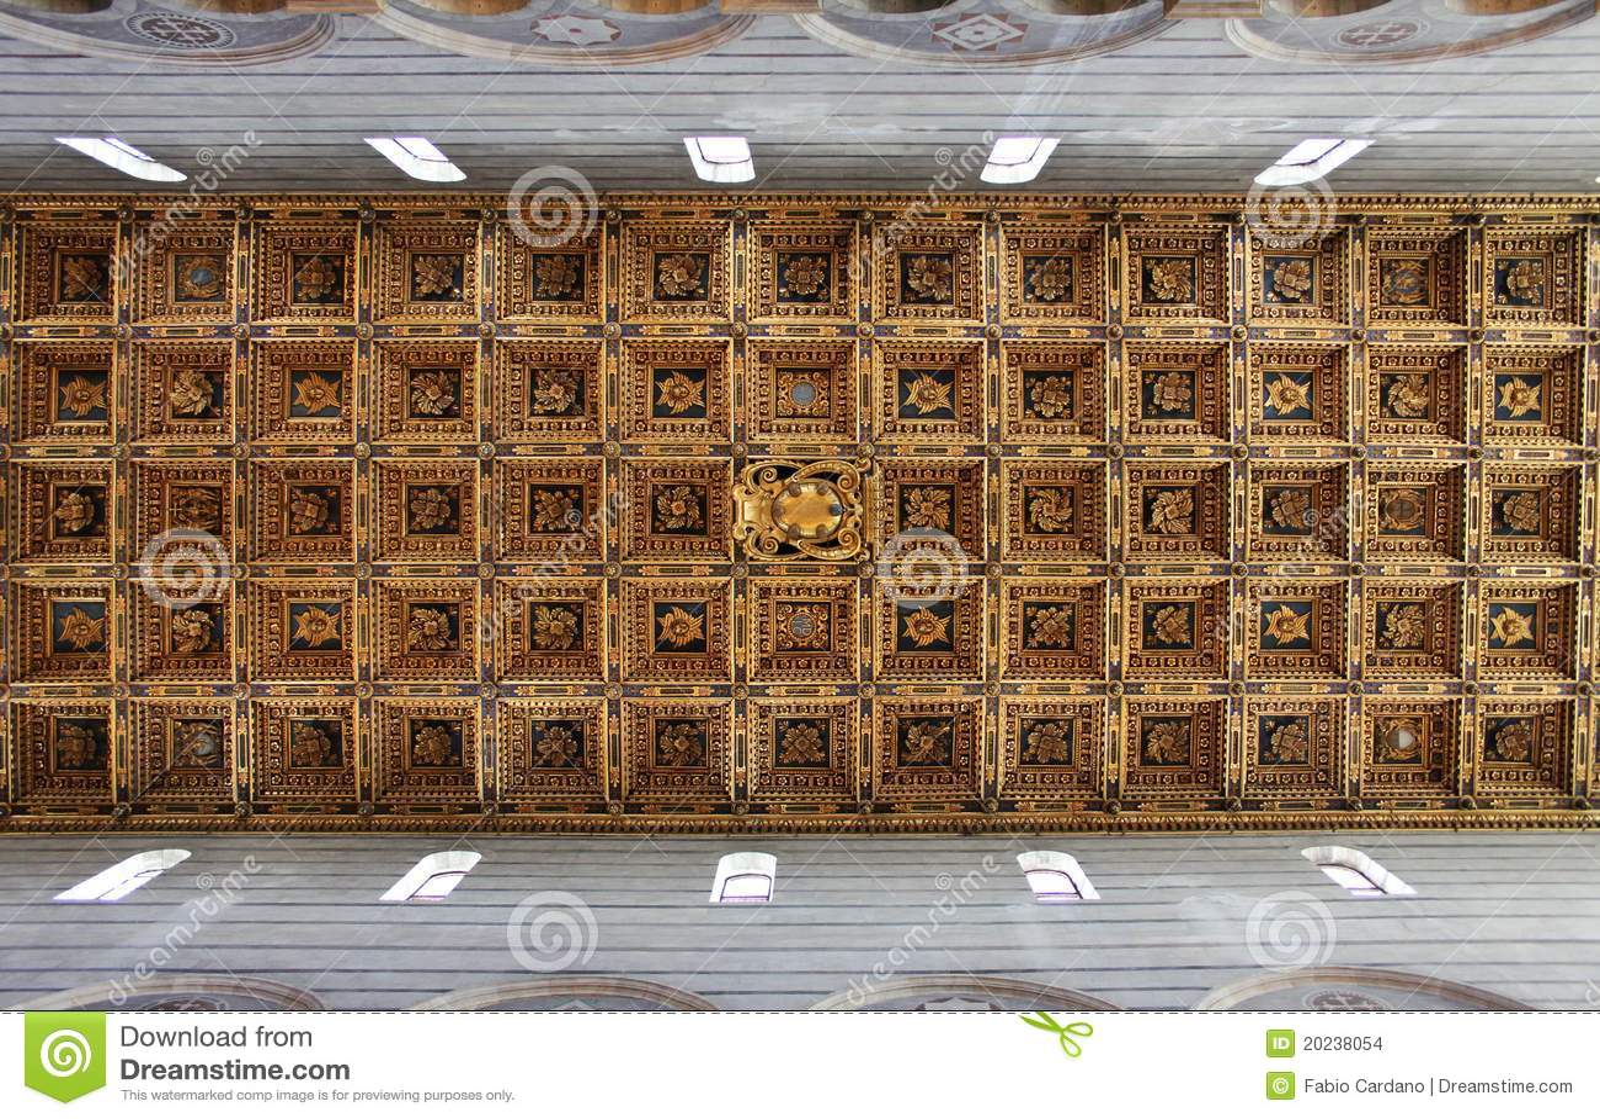 Coffered ceiling stock photo. Image of indoor, pisa, craft ...